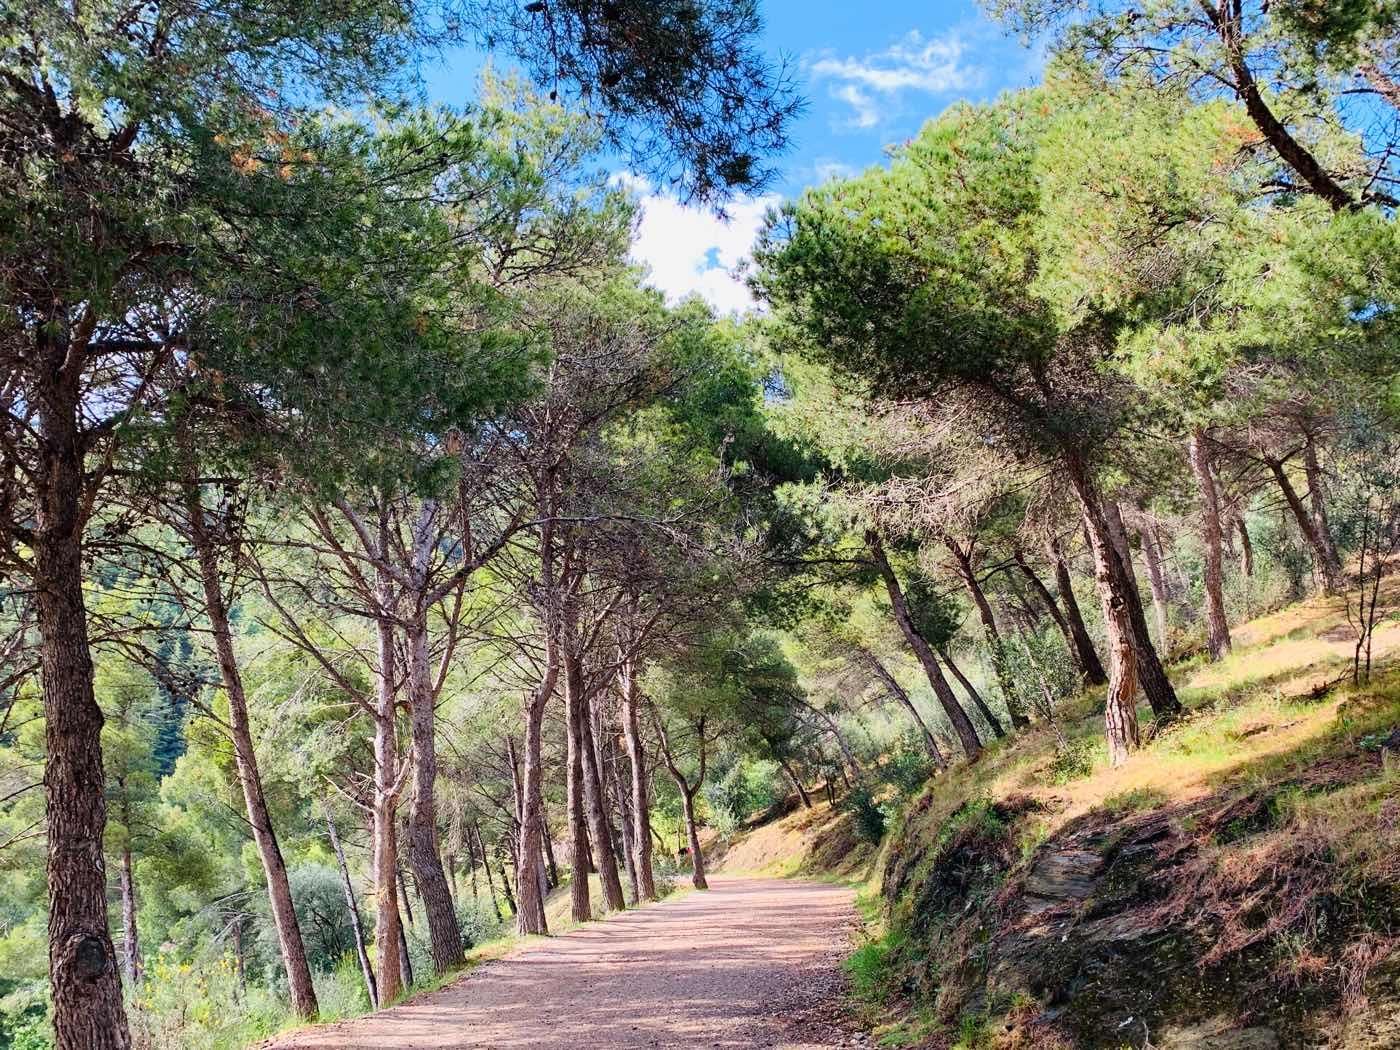 barcelona hidden gems forest trail Barcelona